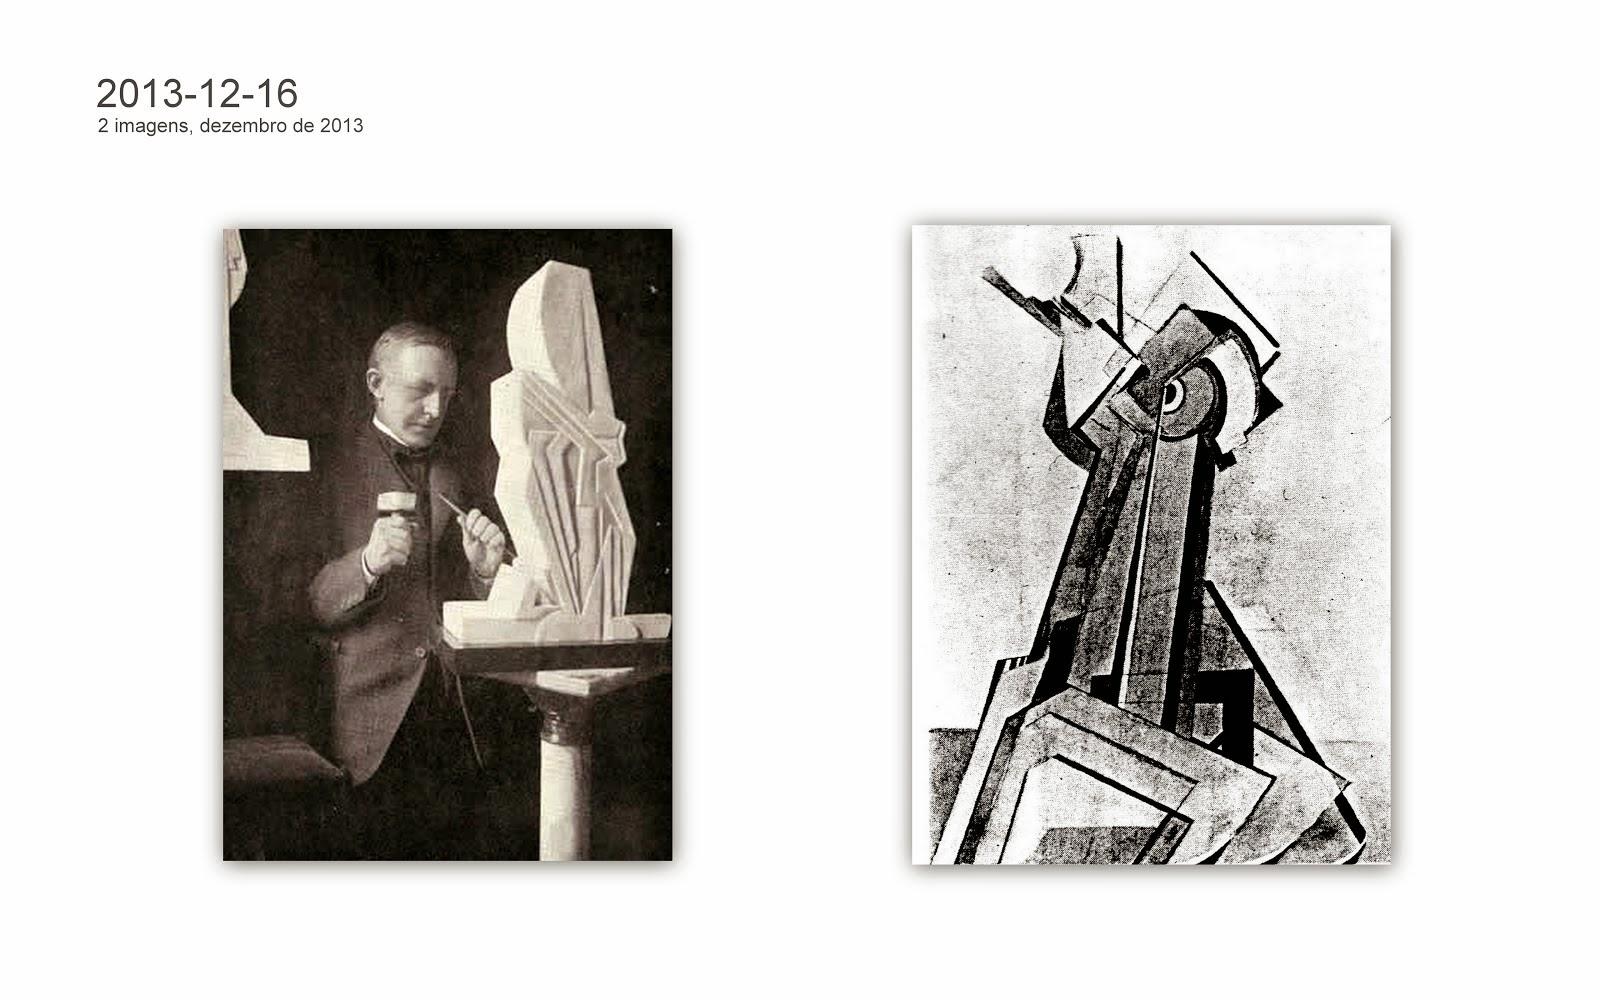 VORTICISMO OU VORTEX  INGLÊS, 1914-1917.